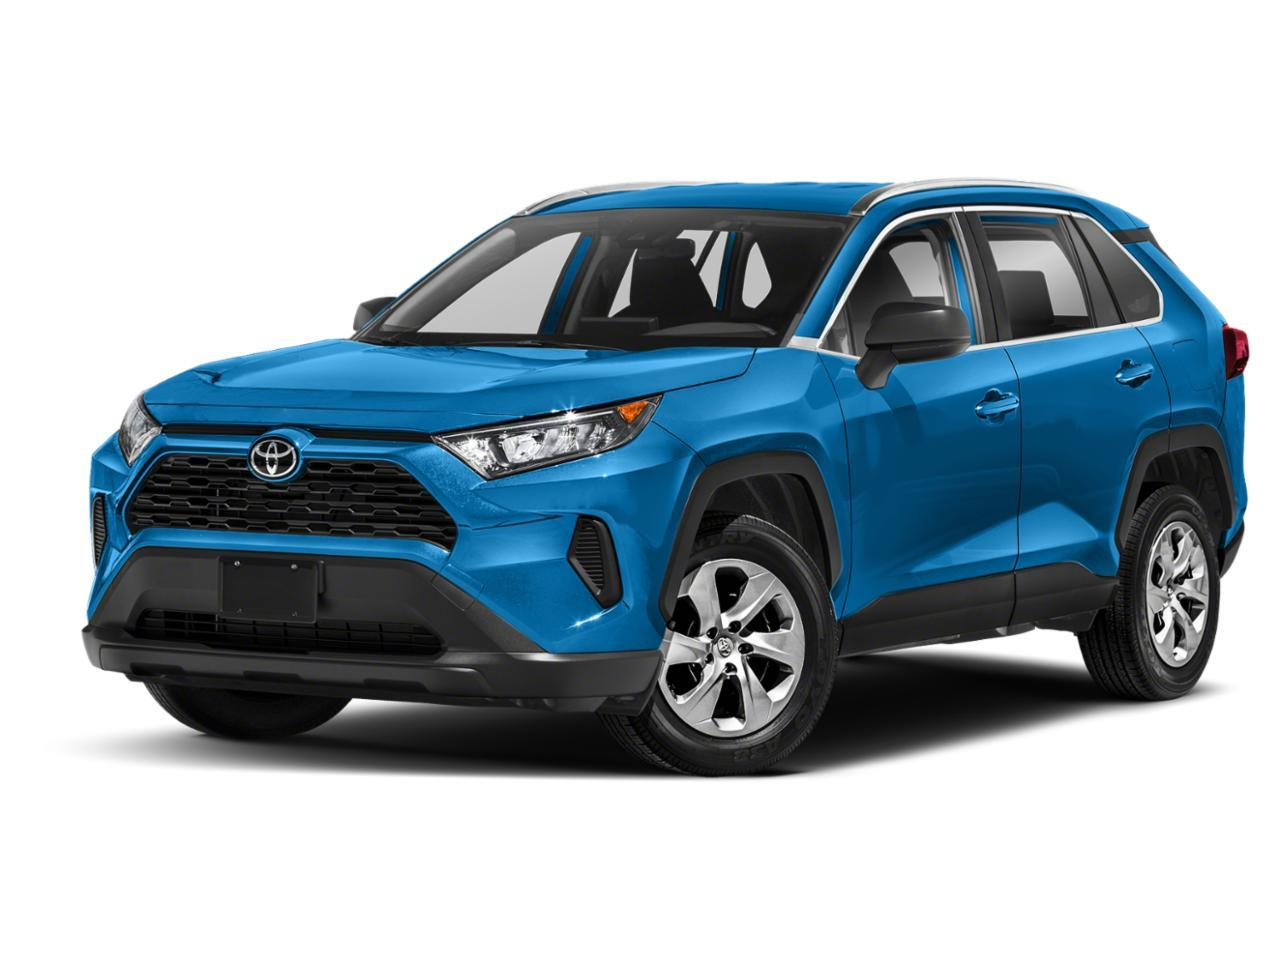 2019 Toyota RAV4 Vehicle Photo in BOONVILLE, IN 47601-9633